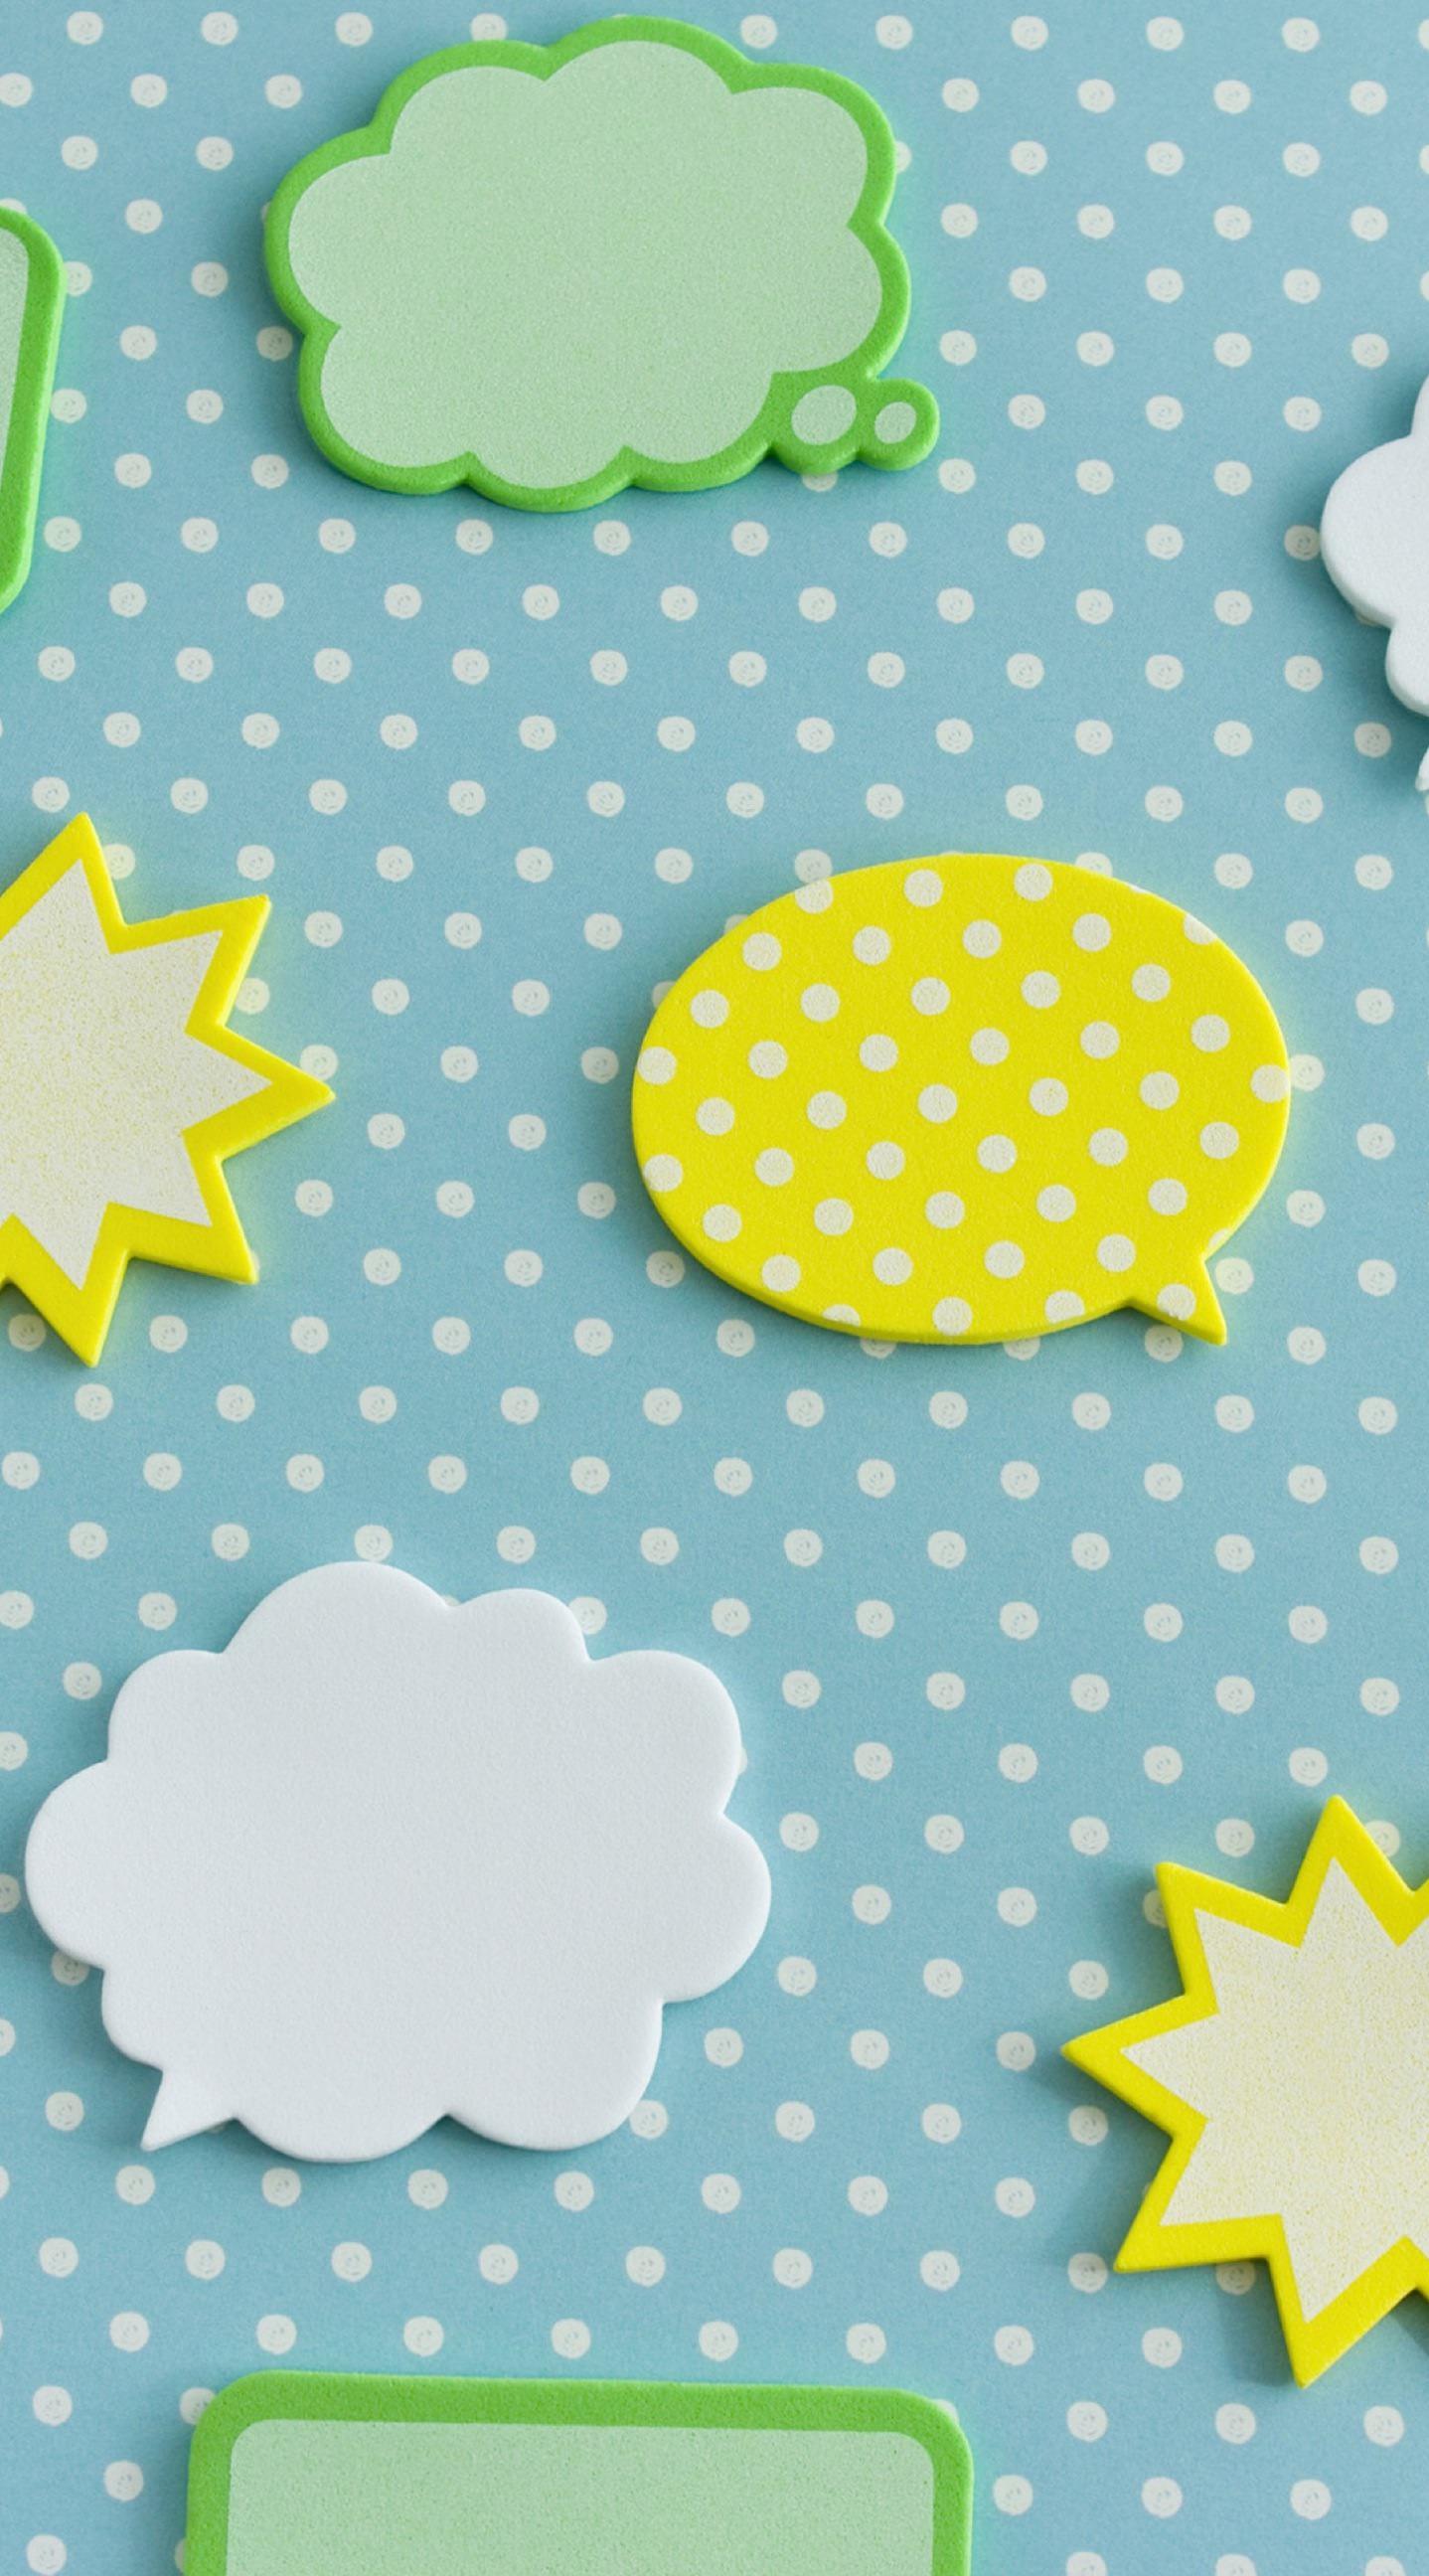 Kuning Hijau Dan Biru Balon Ilustrasi Lucu